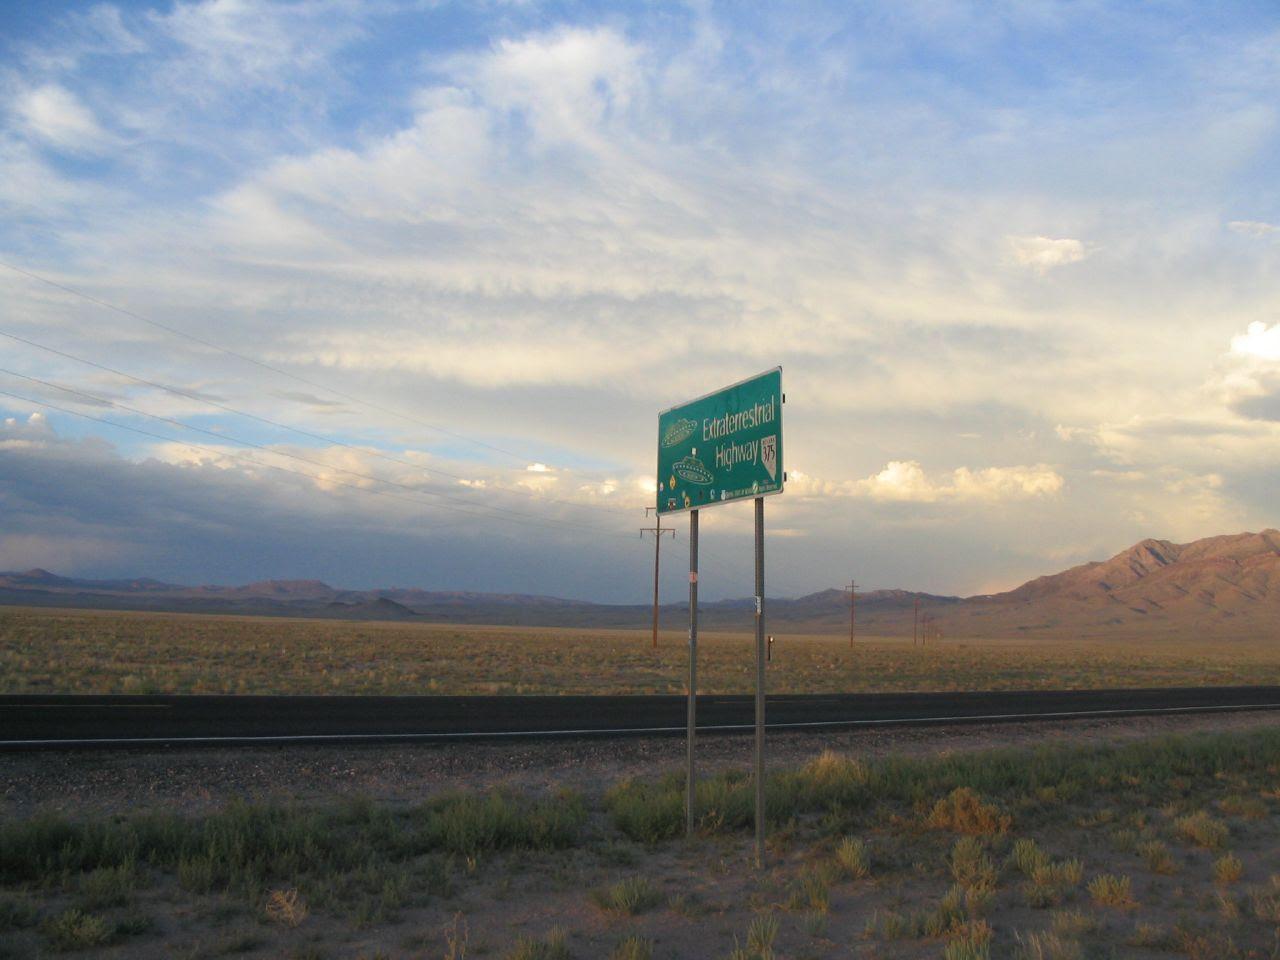 Little Al`e Inn, Rachel, Nevada, The Extraterrestrial Highway, Nevada State Route 375